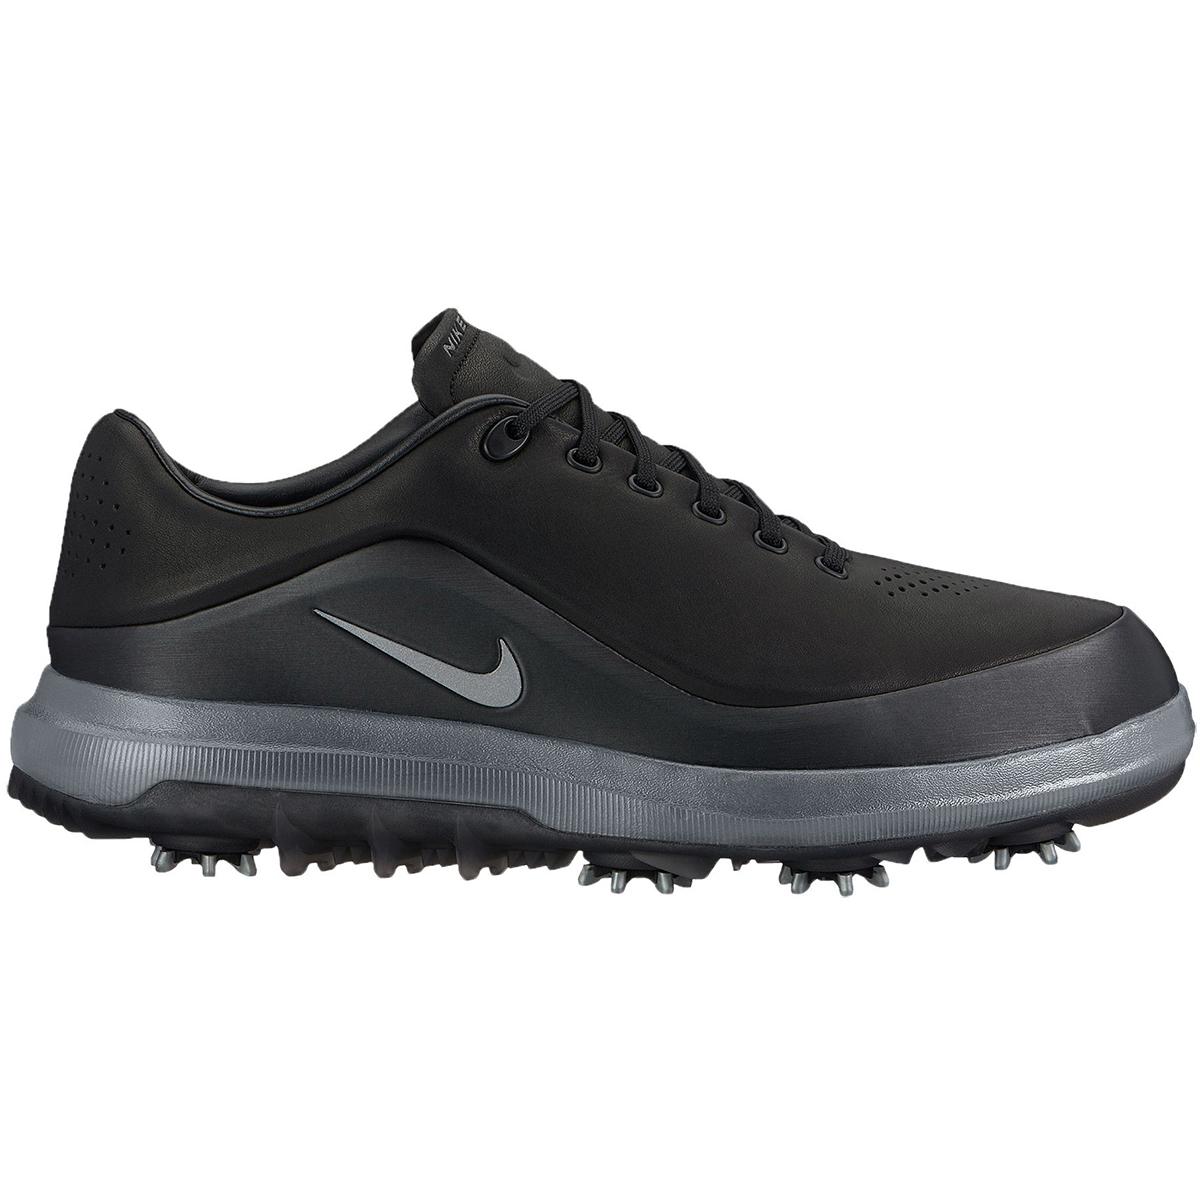 brand new be543 81b8b ... Nike Air Zoom Precision S8 ...